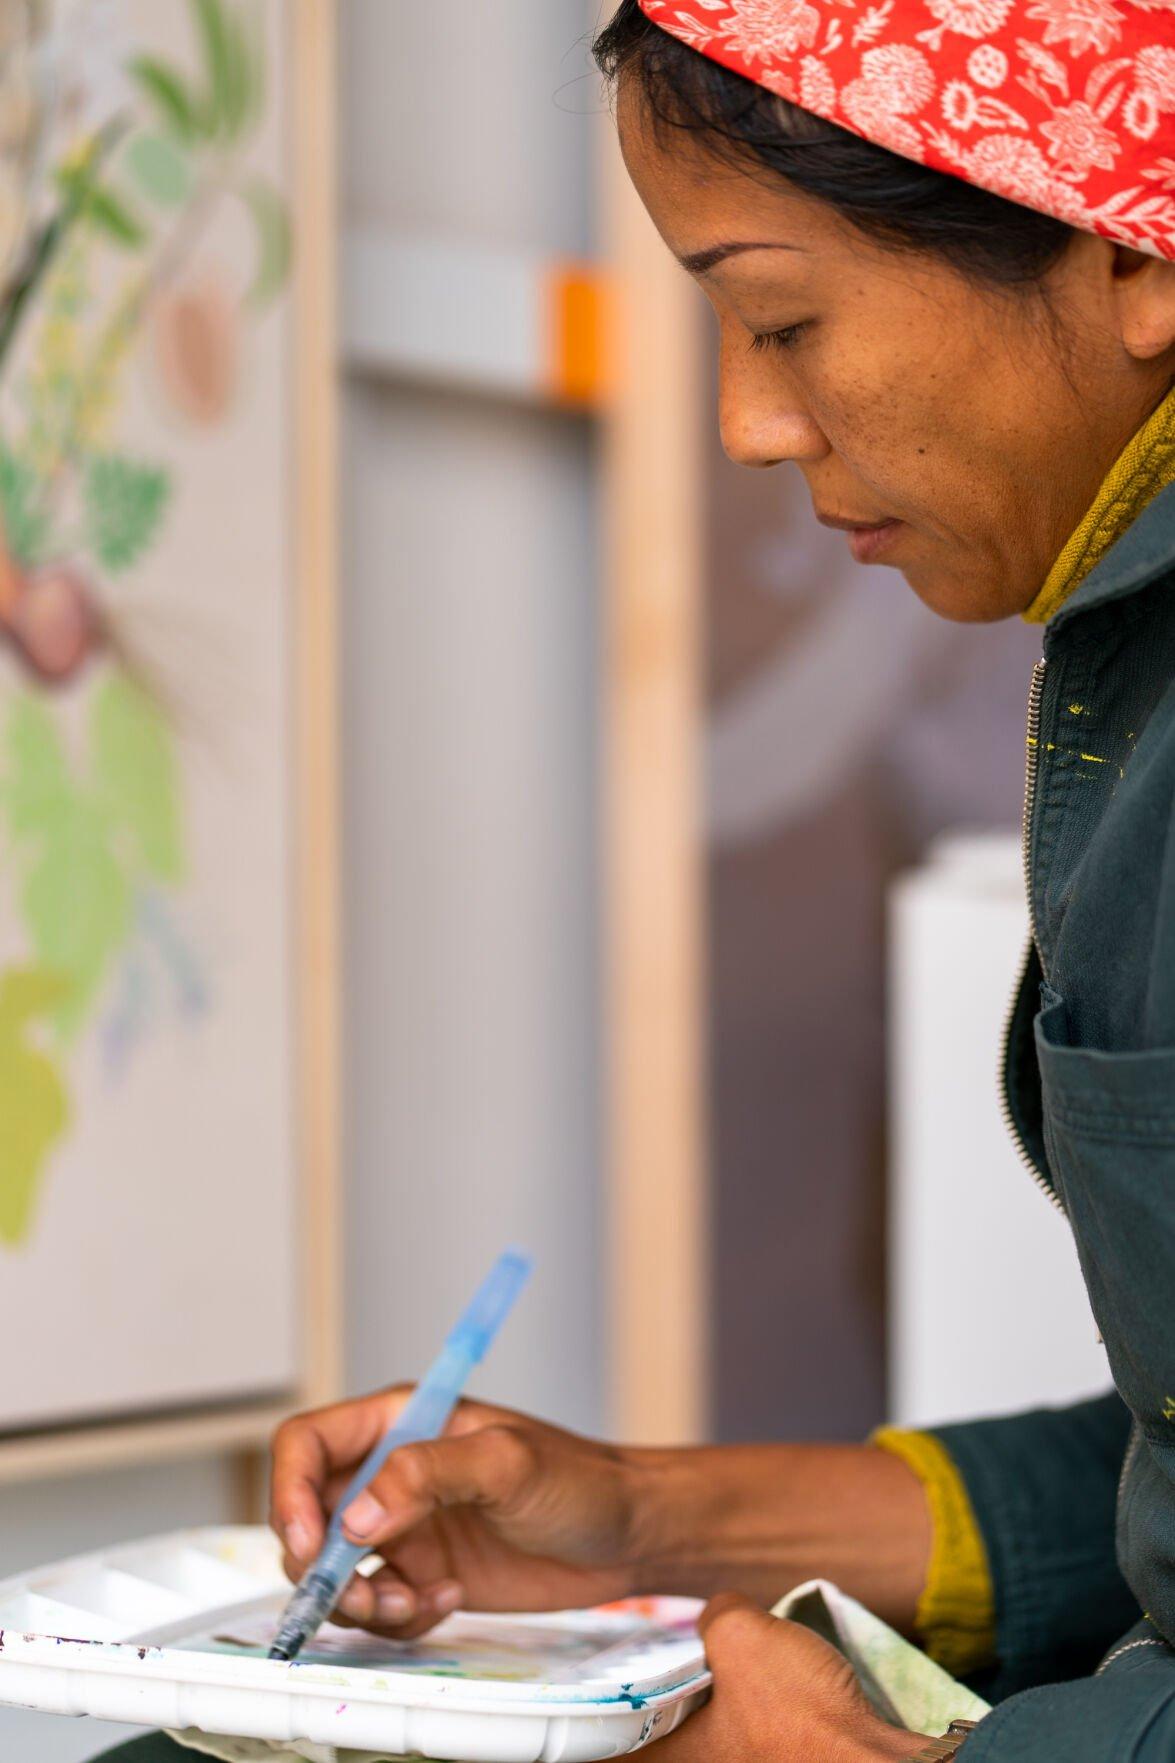 Jane Kim painting in studio